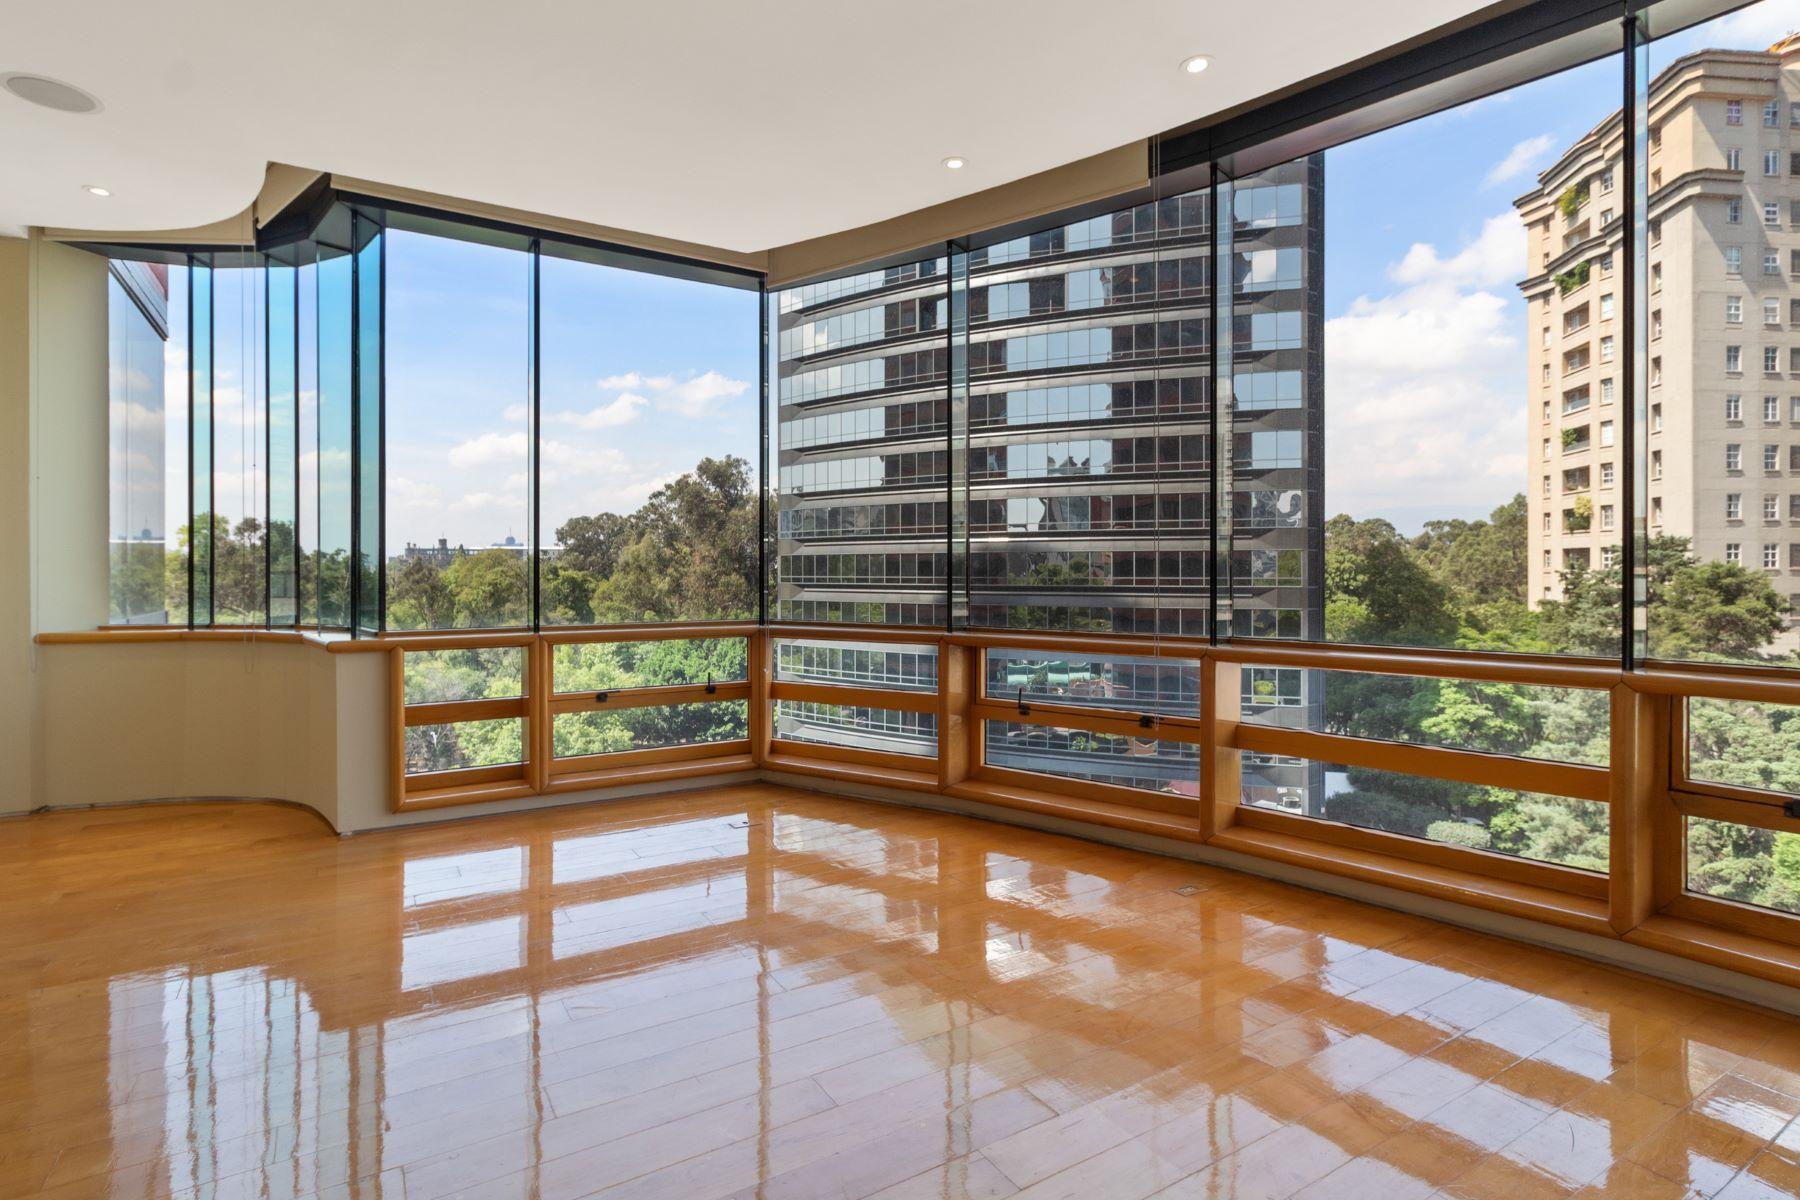 Apartments のために 賃貸 アット DepartamentoTorresDelParque Ruben Dario 115 ResidencialdelBosque Polanco, メキシコの各都市 11560 メキシコ